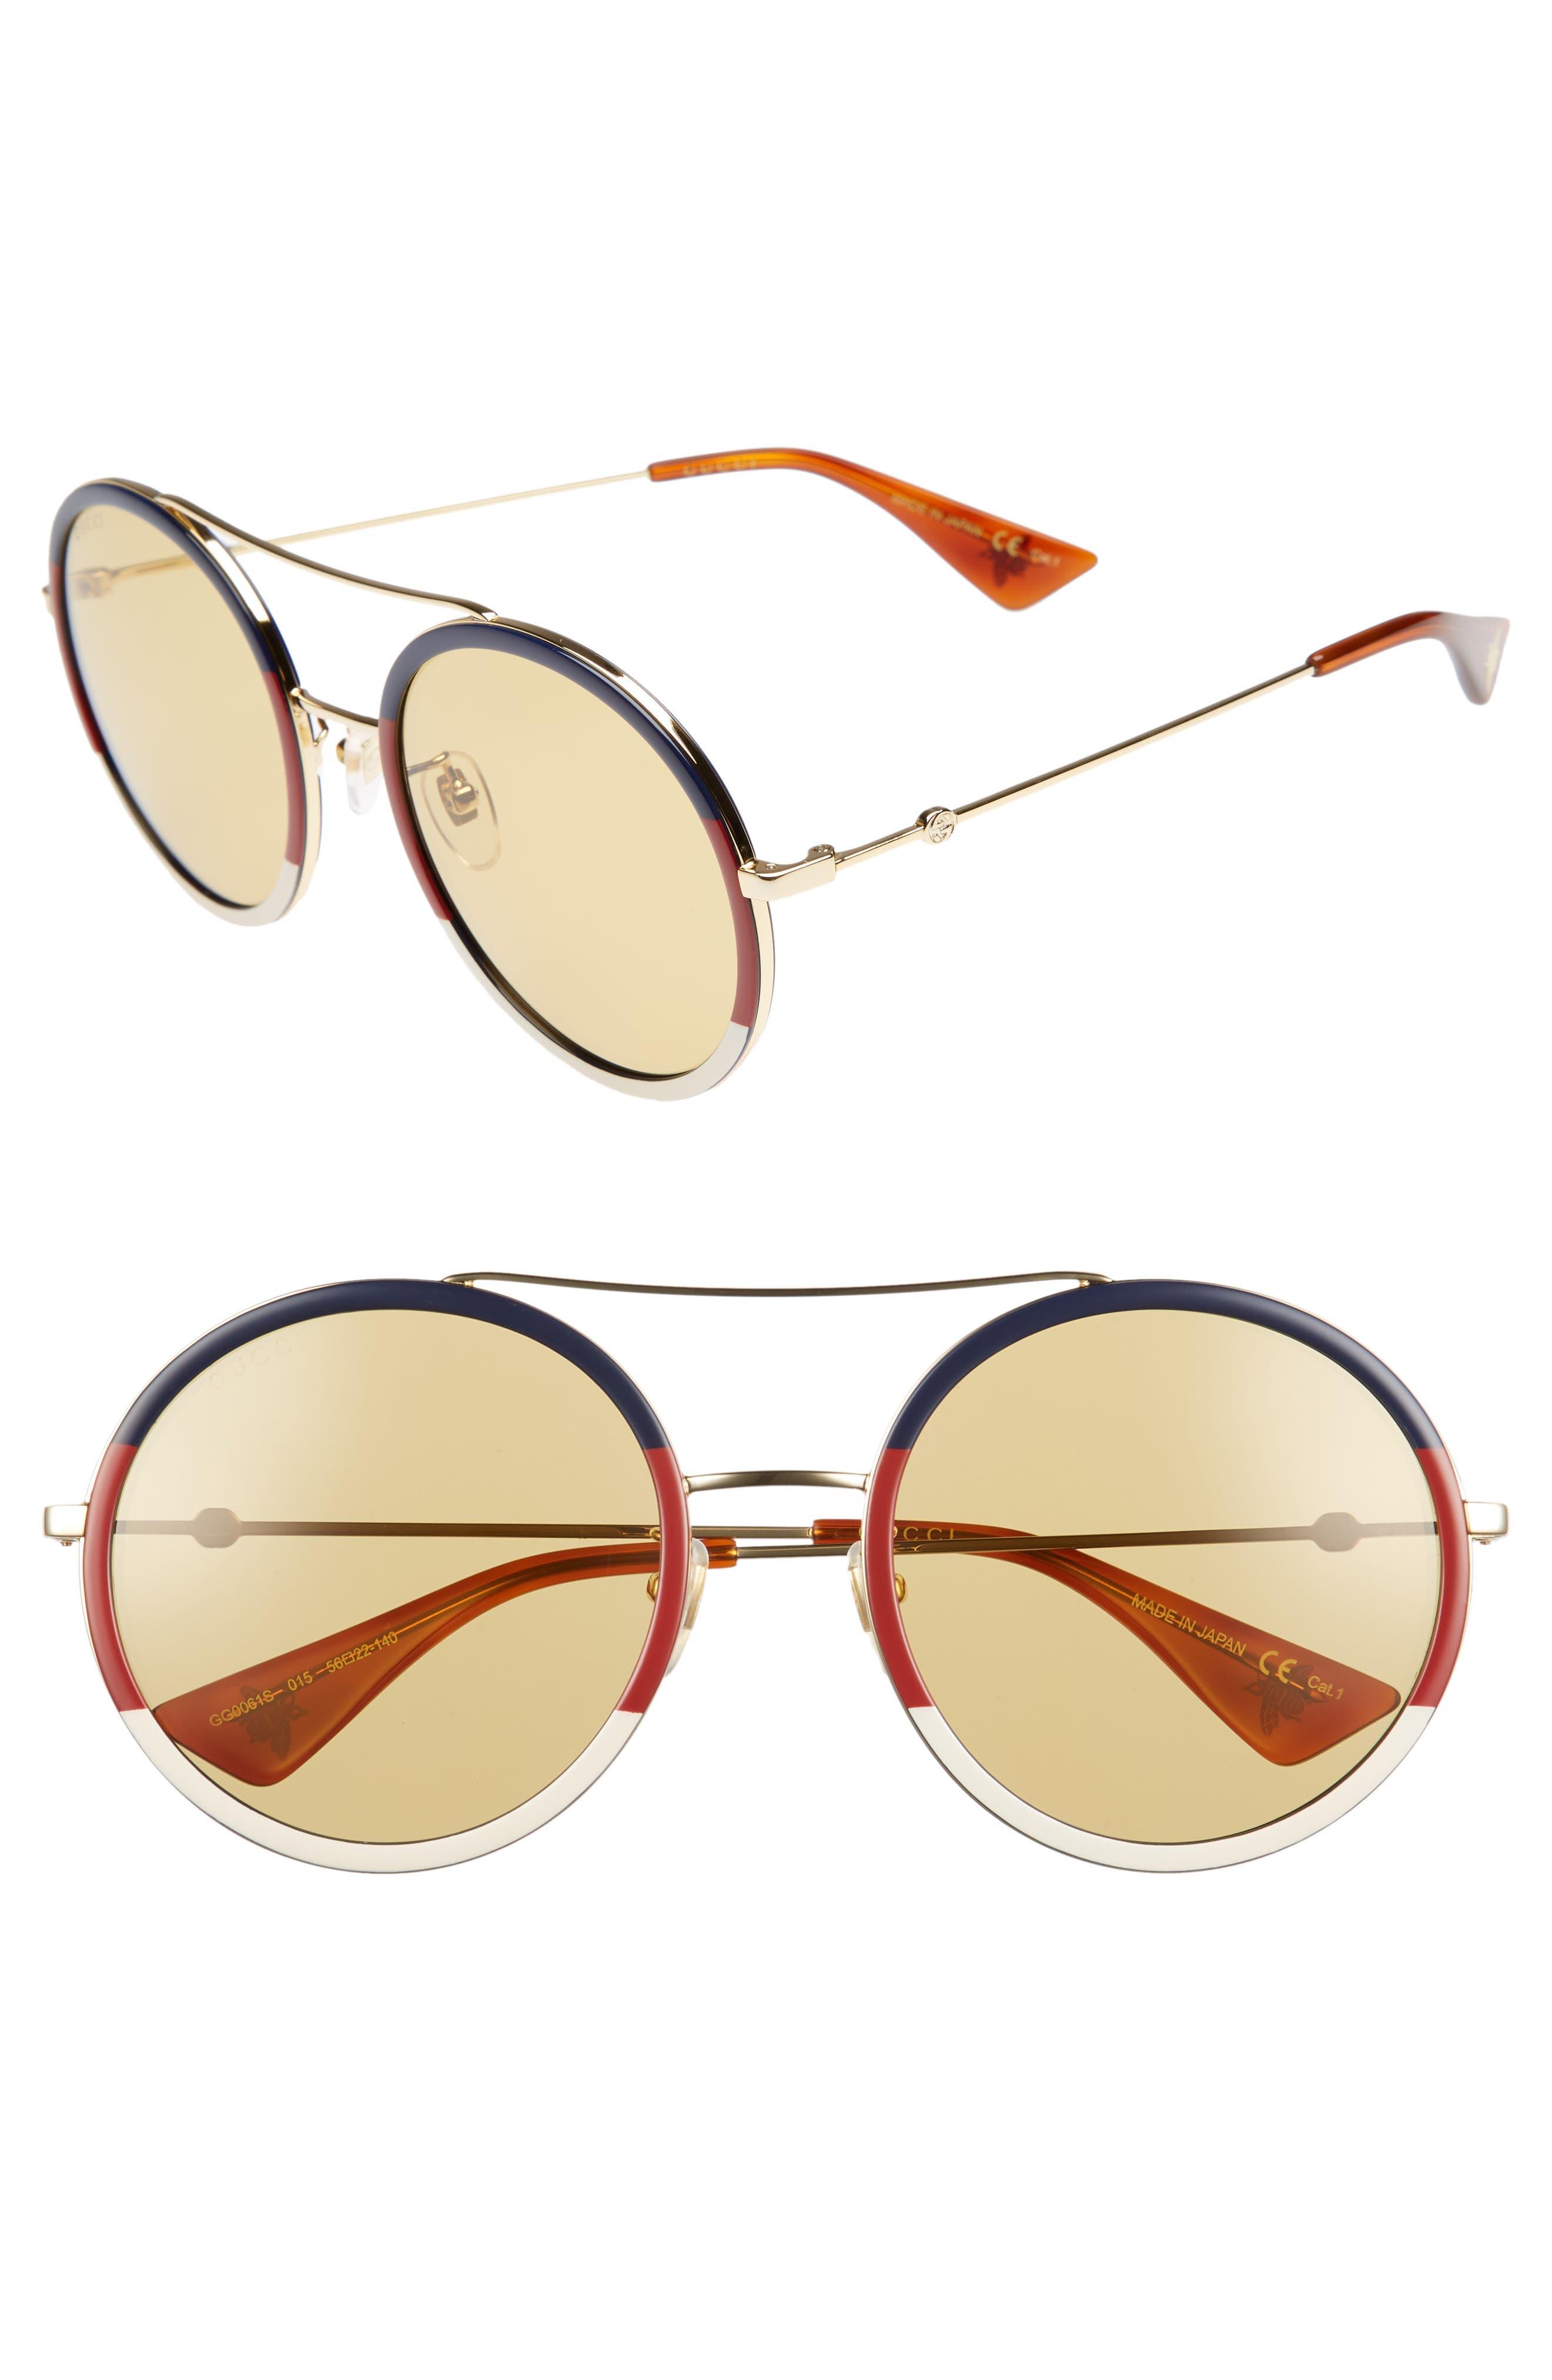 56mm Round Sunglasses,                         Main,                         color, GOLD/ BLONDE HAVANA